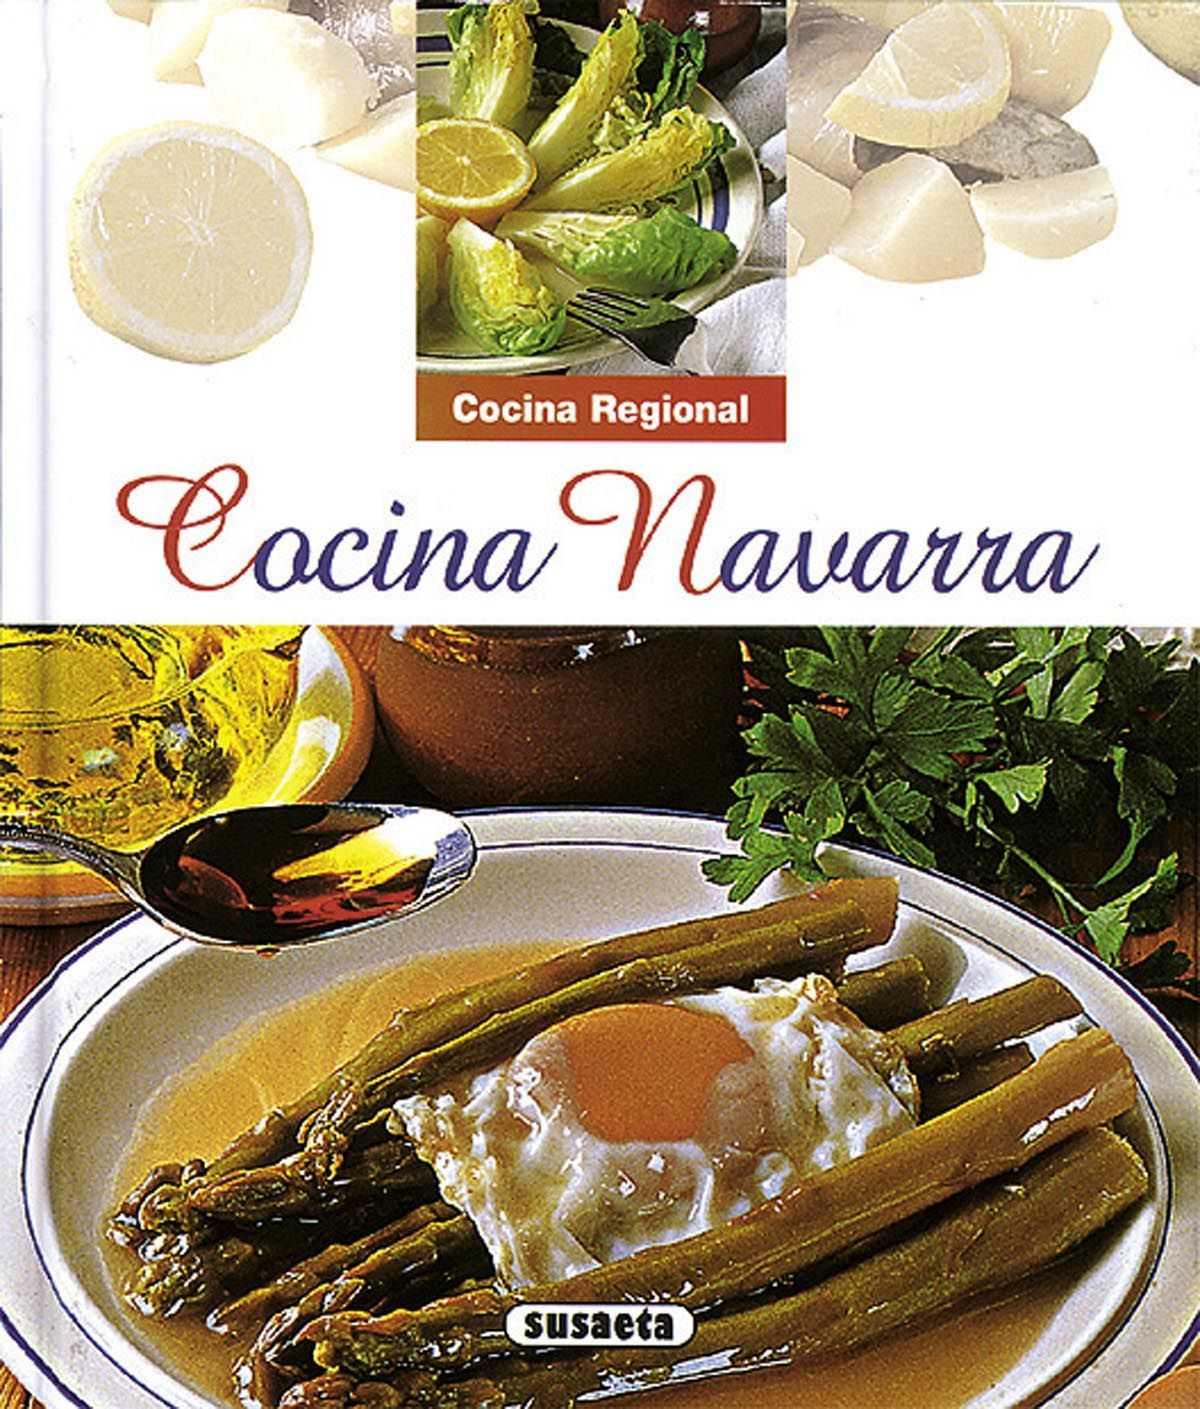 COCINA NAVARRA